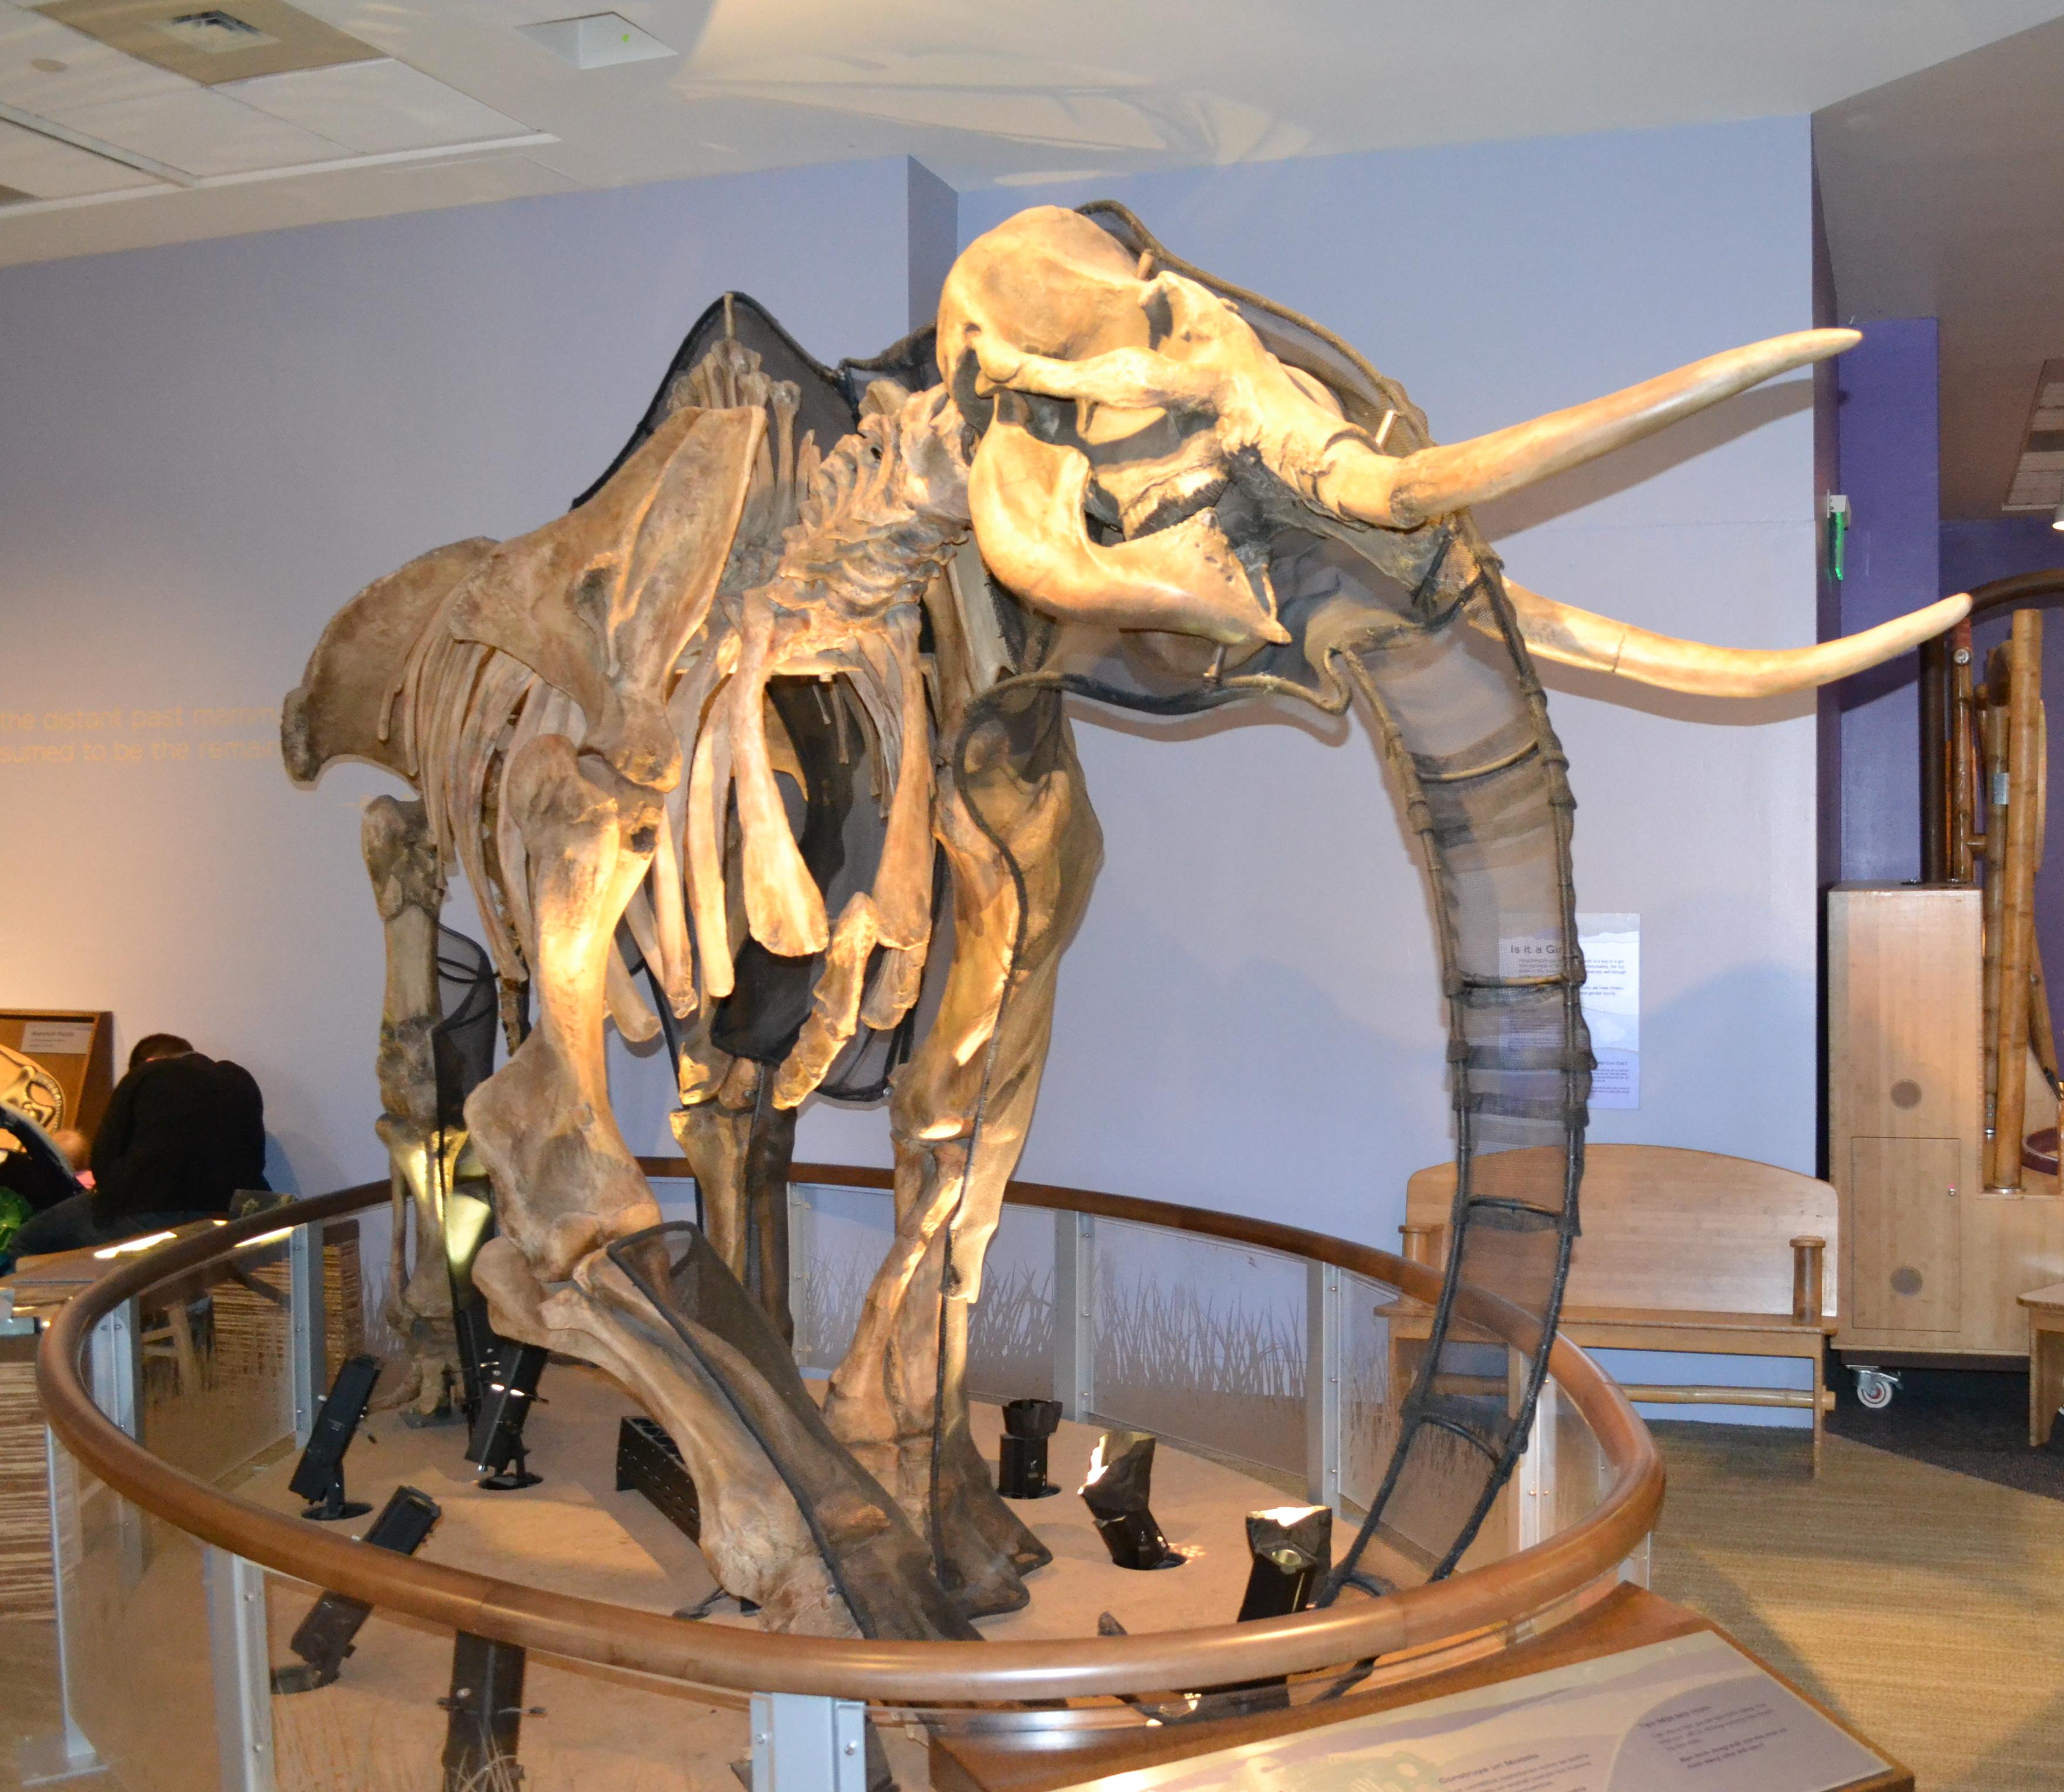 ... display at Children's discovery museum in San Jose, California.JPG